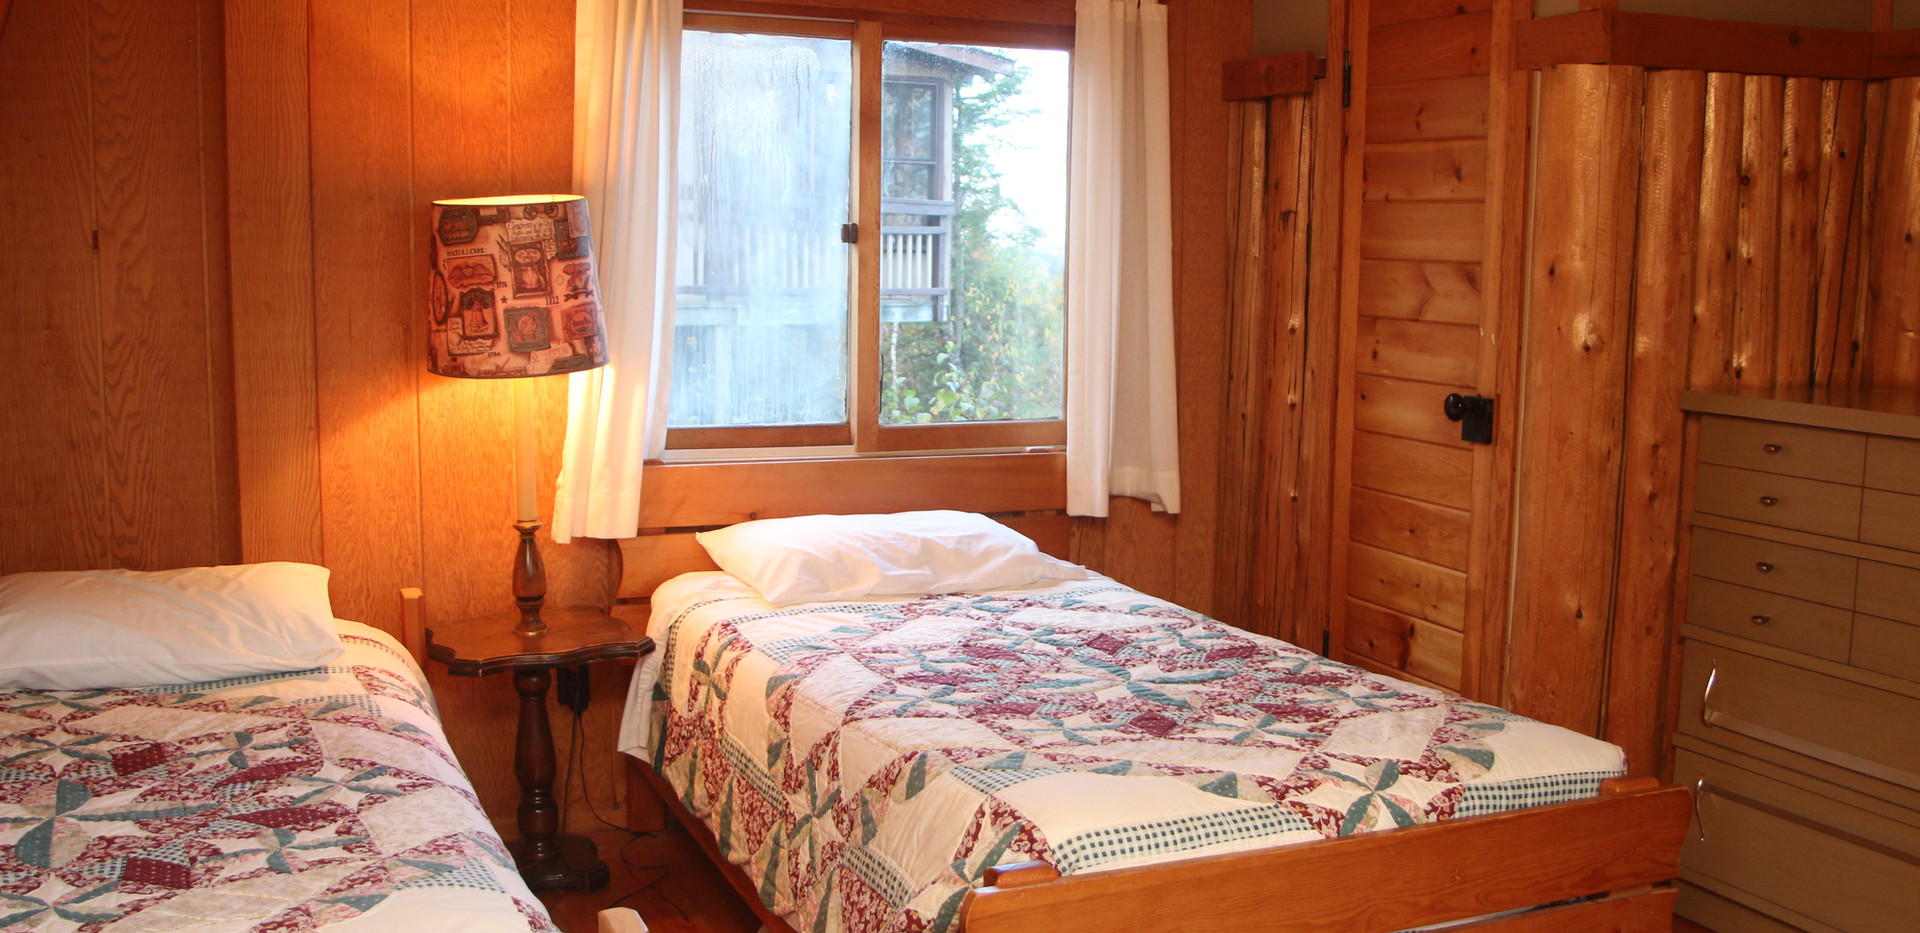 Split loft with single beds.